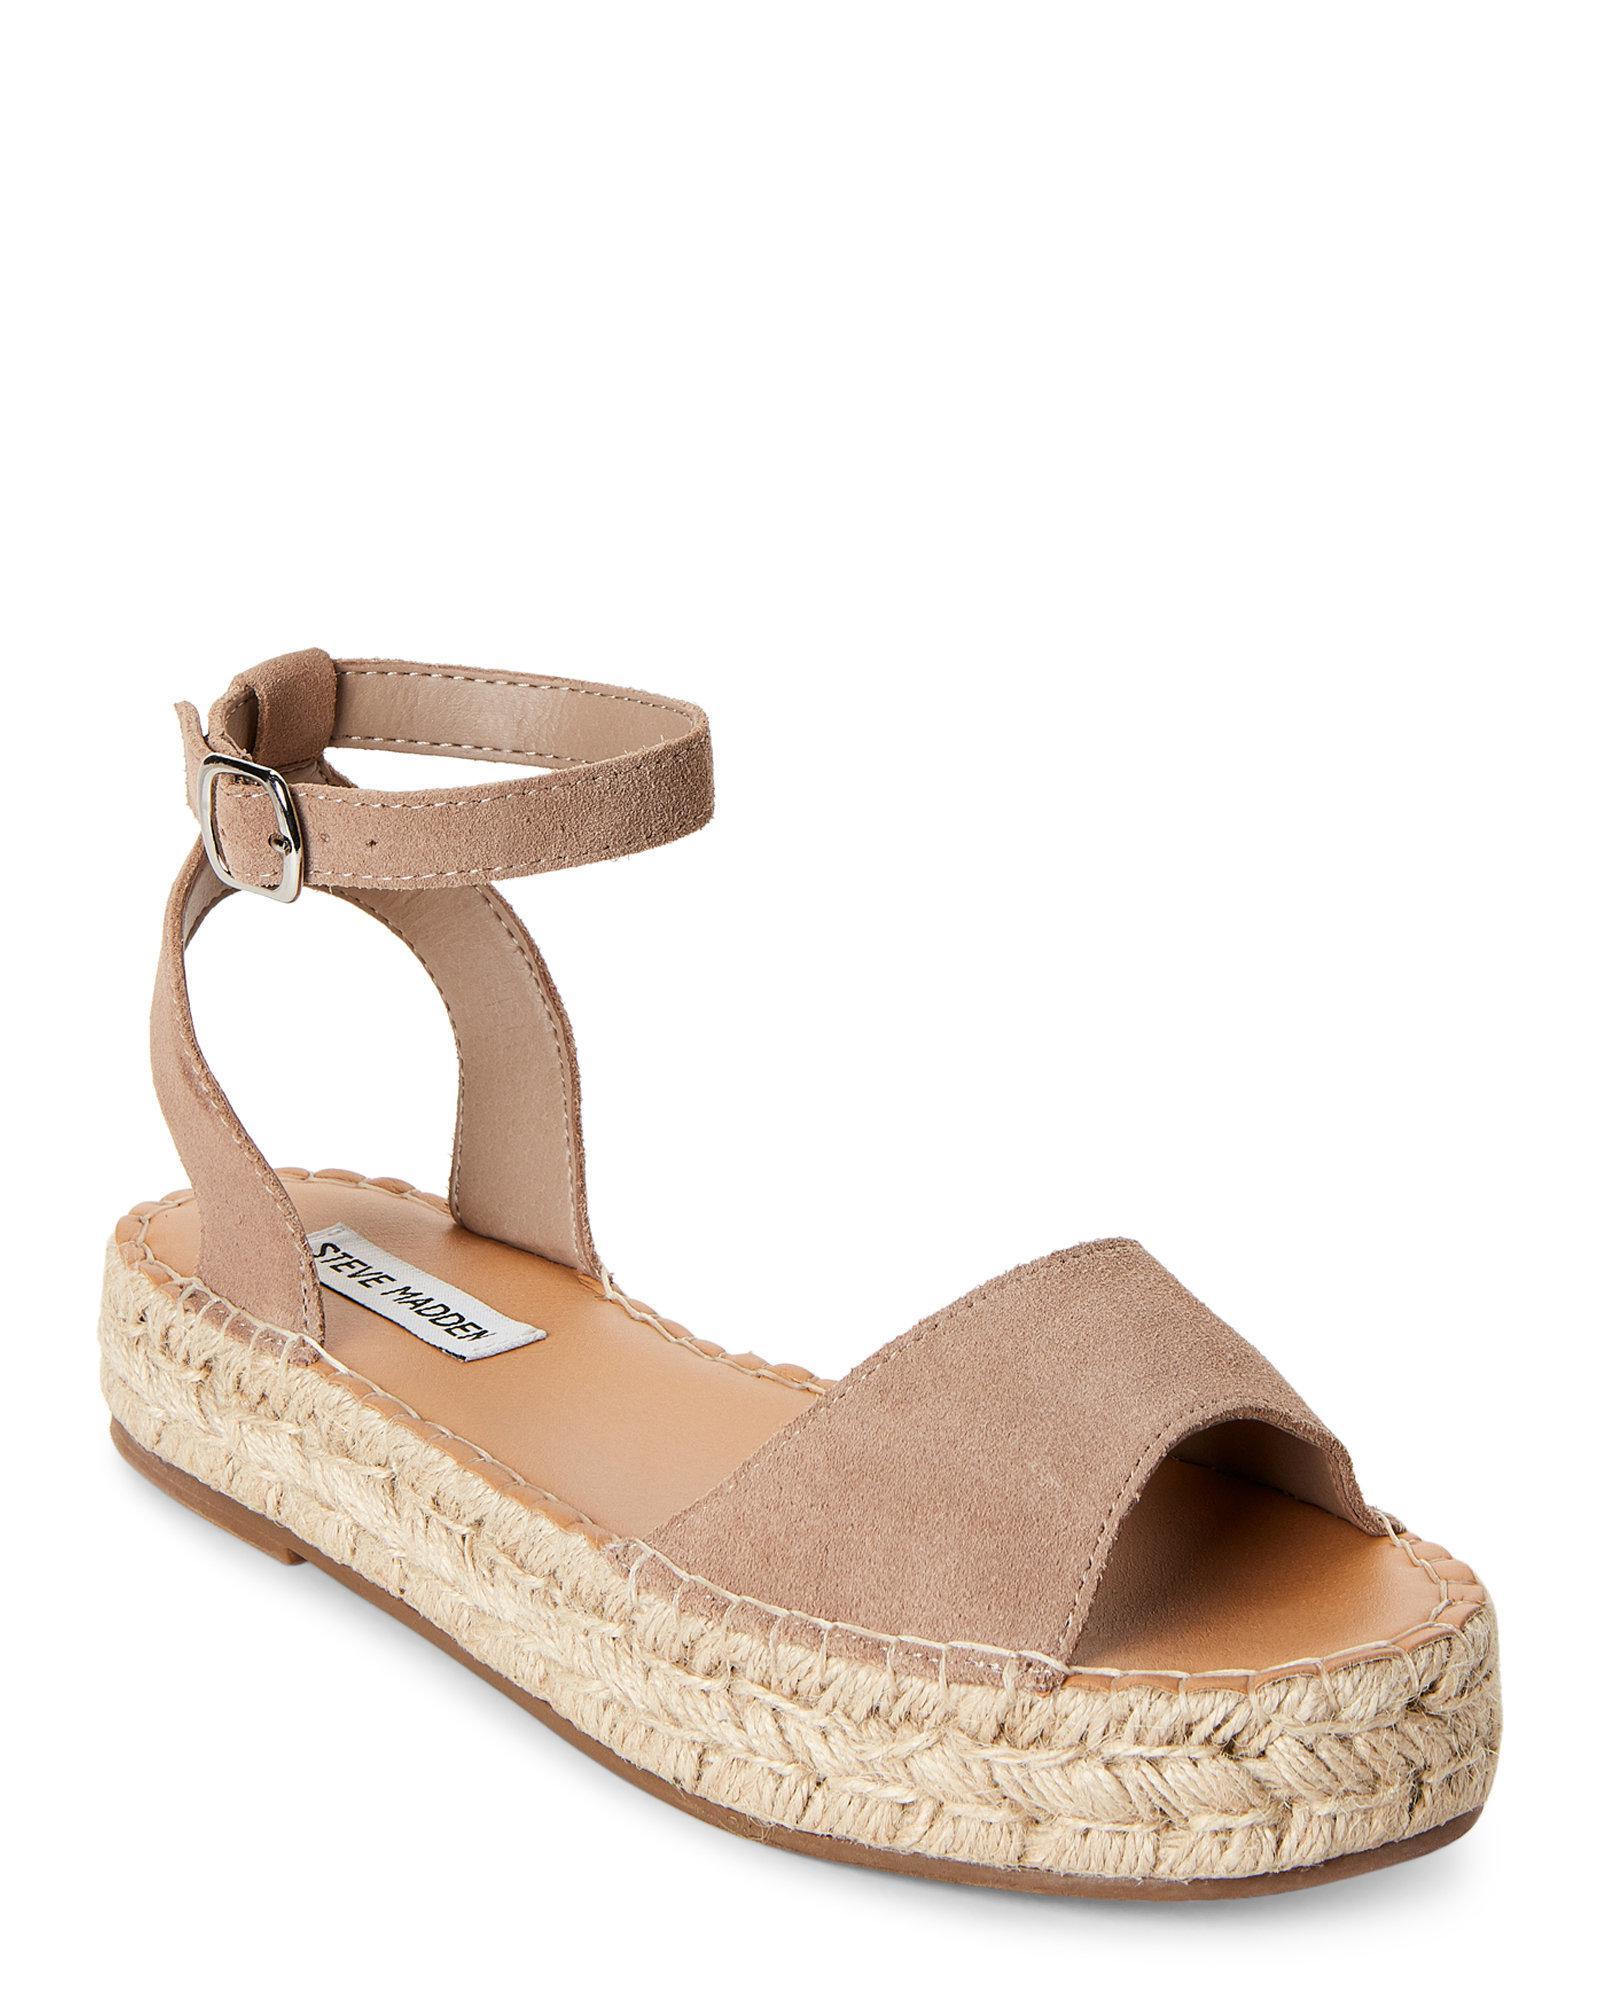 3c937d99de8 Lyst - Steve Madden Sand Irys Platform Espadrille Sandals